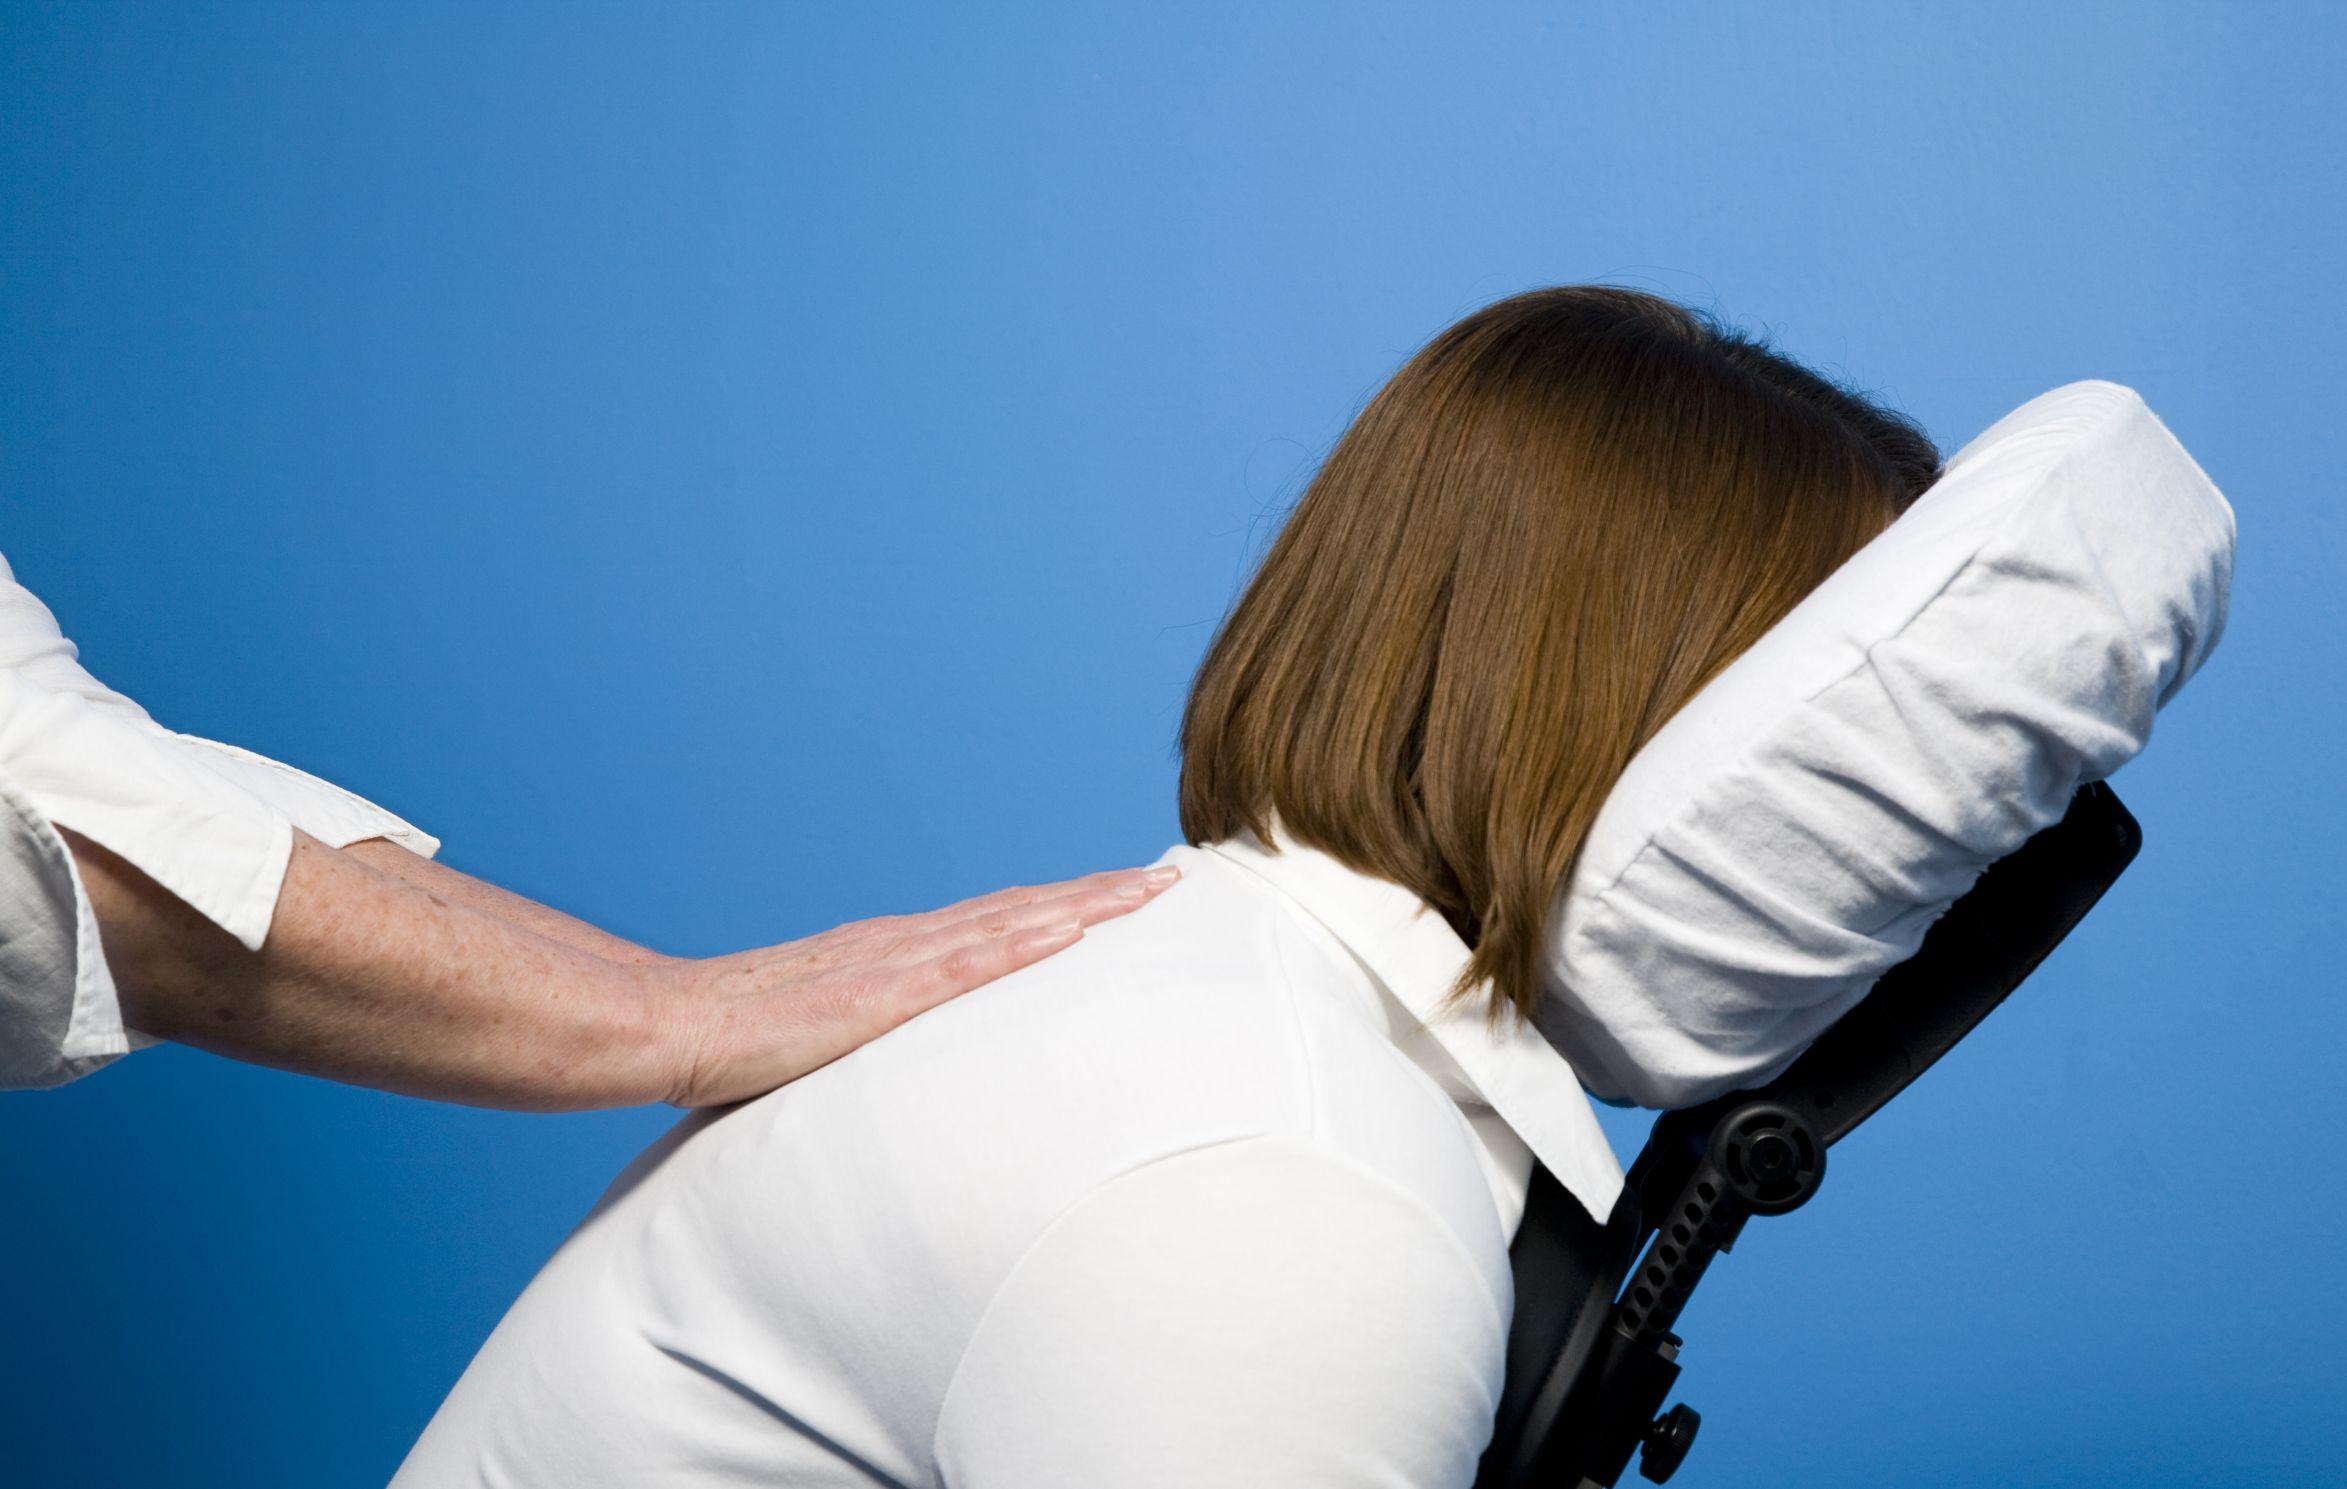 Chair massage benefits - Chair Massage Benefits 37